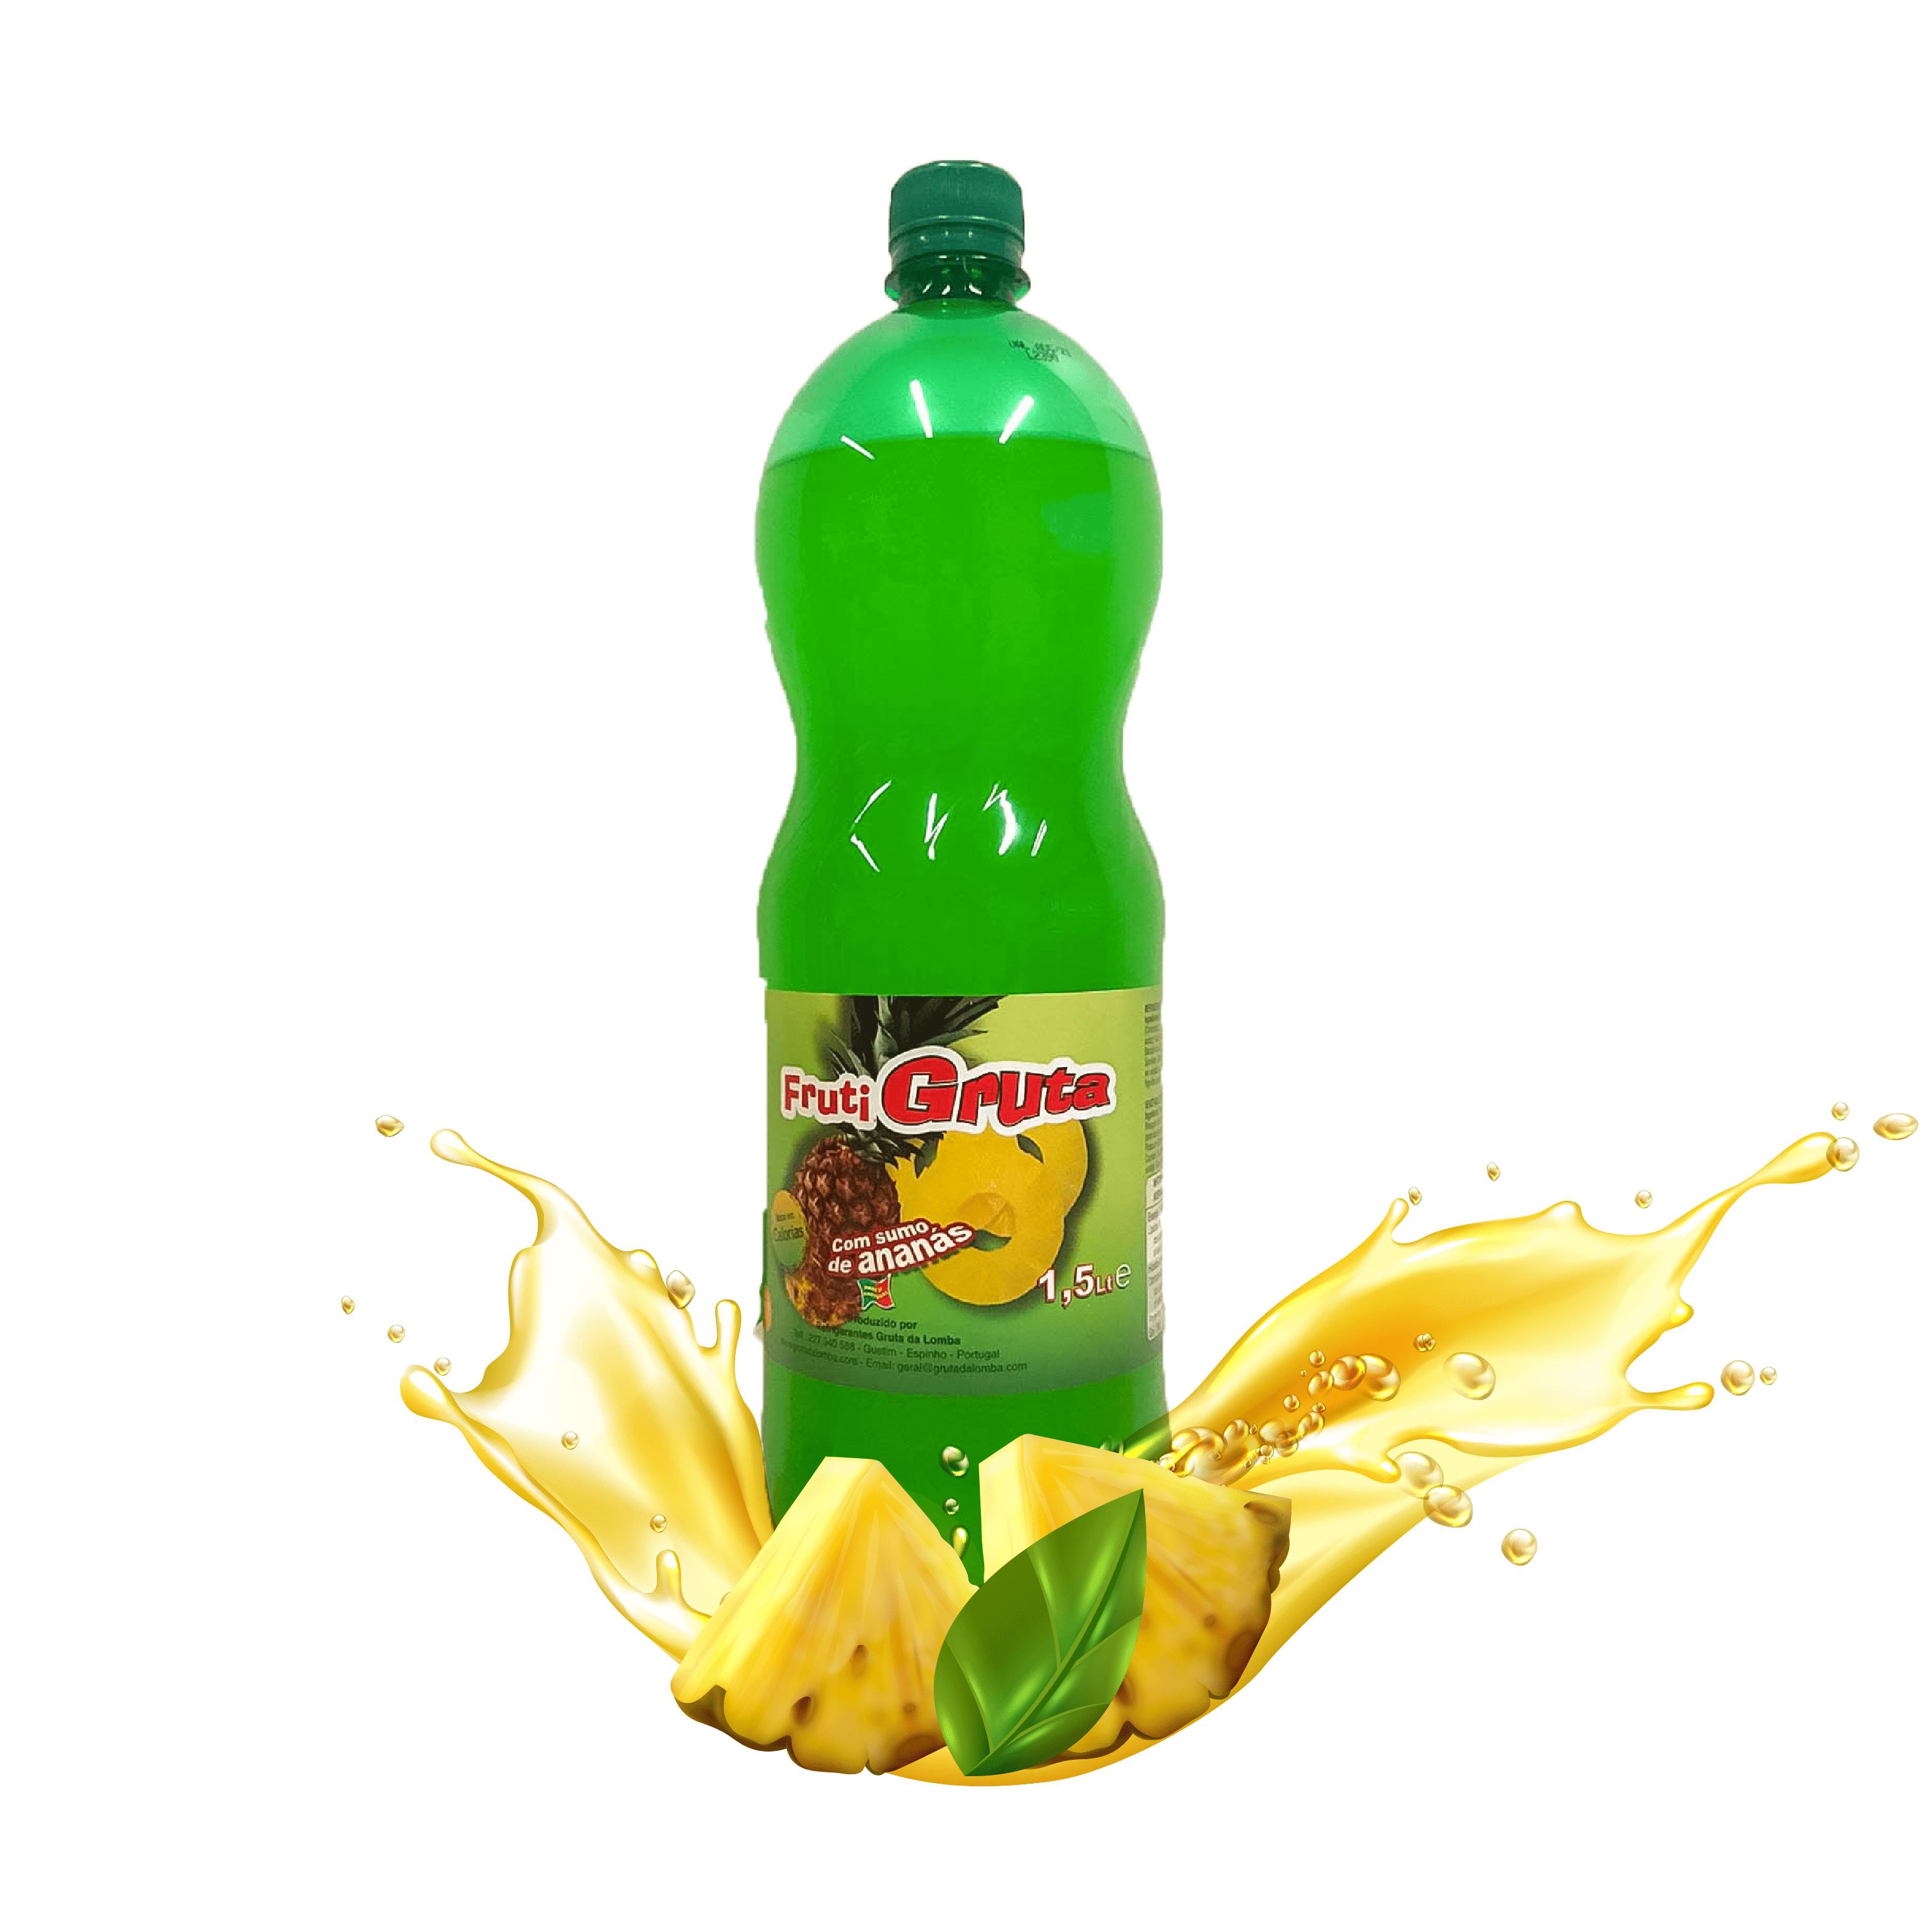 frutigruta ananas gruta da lomba